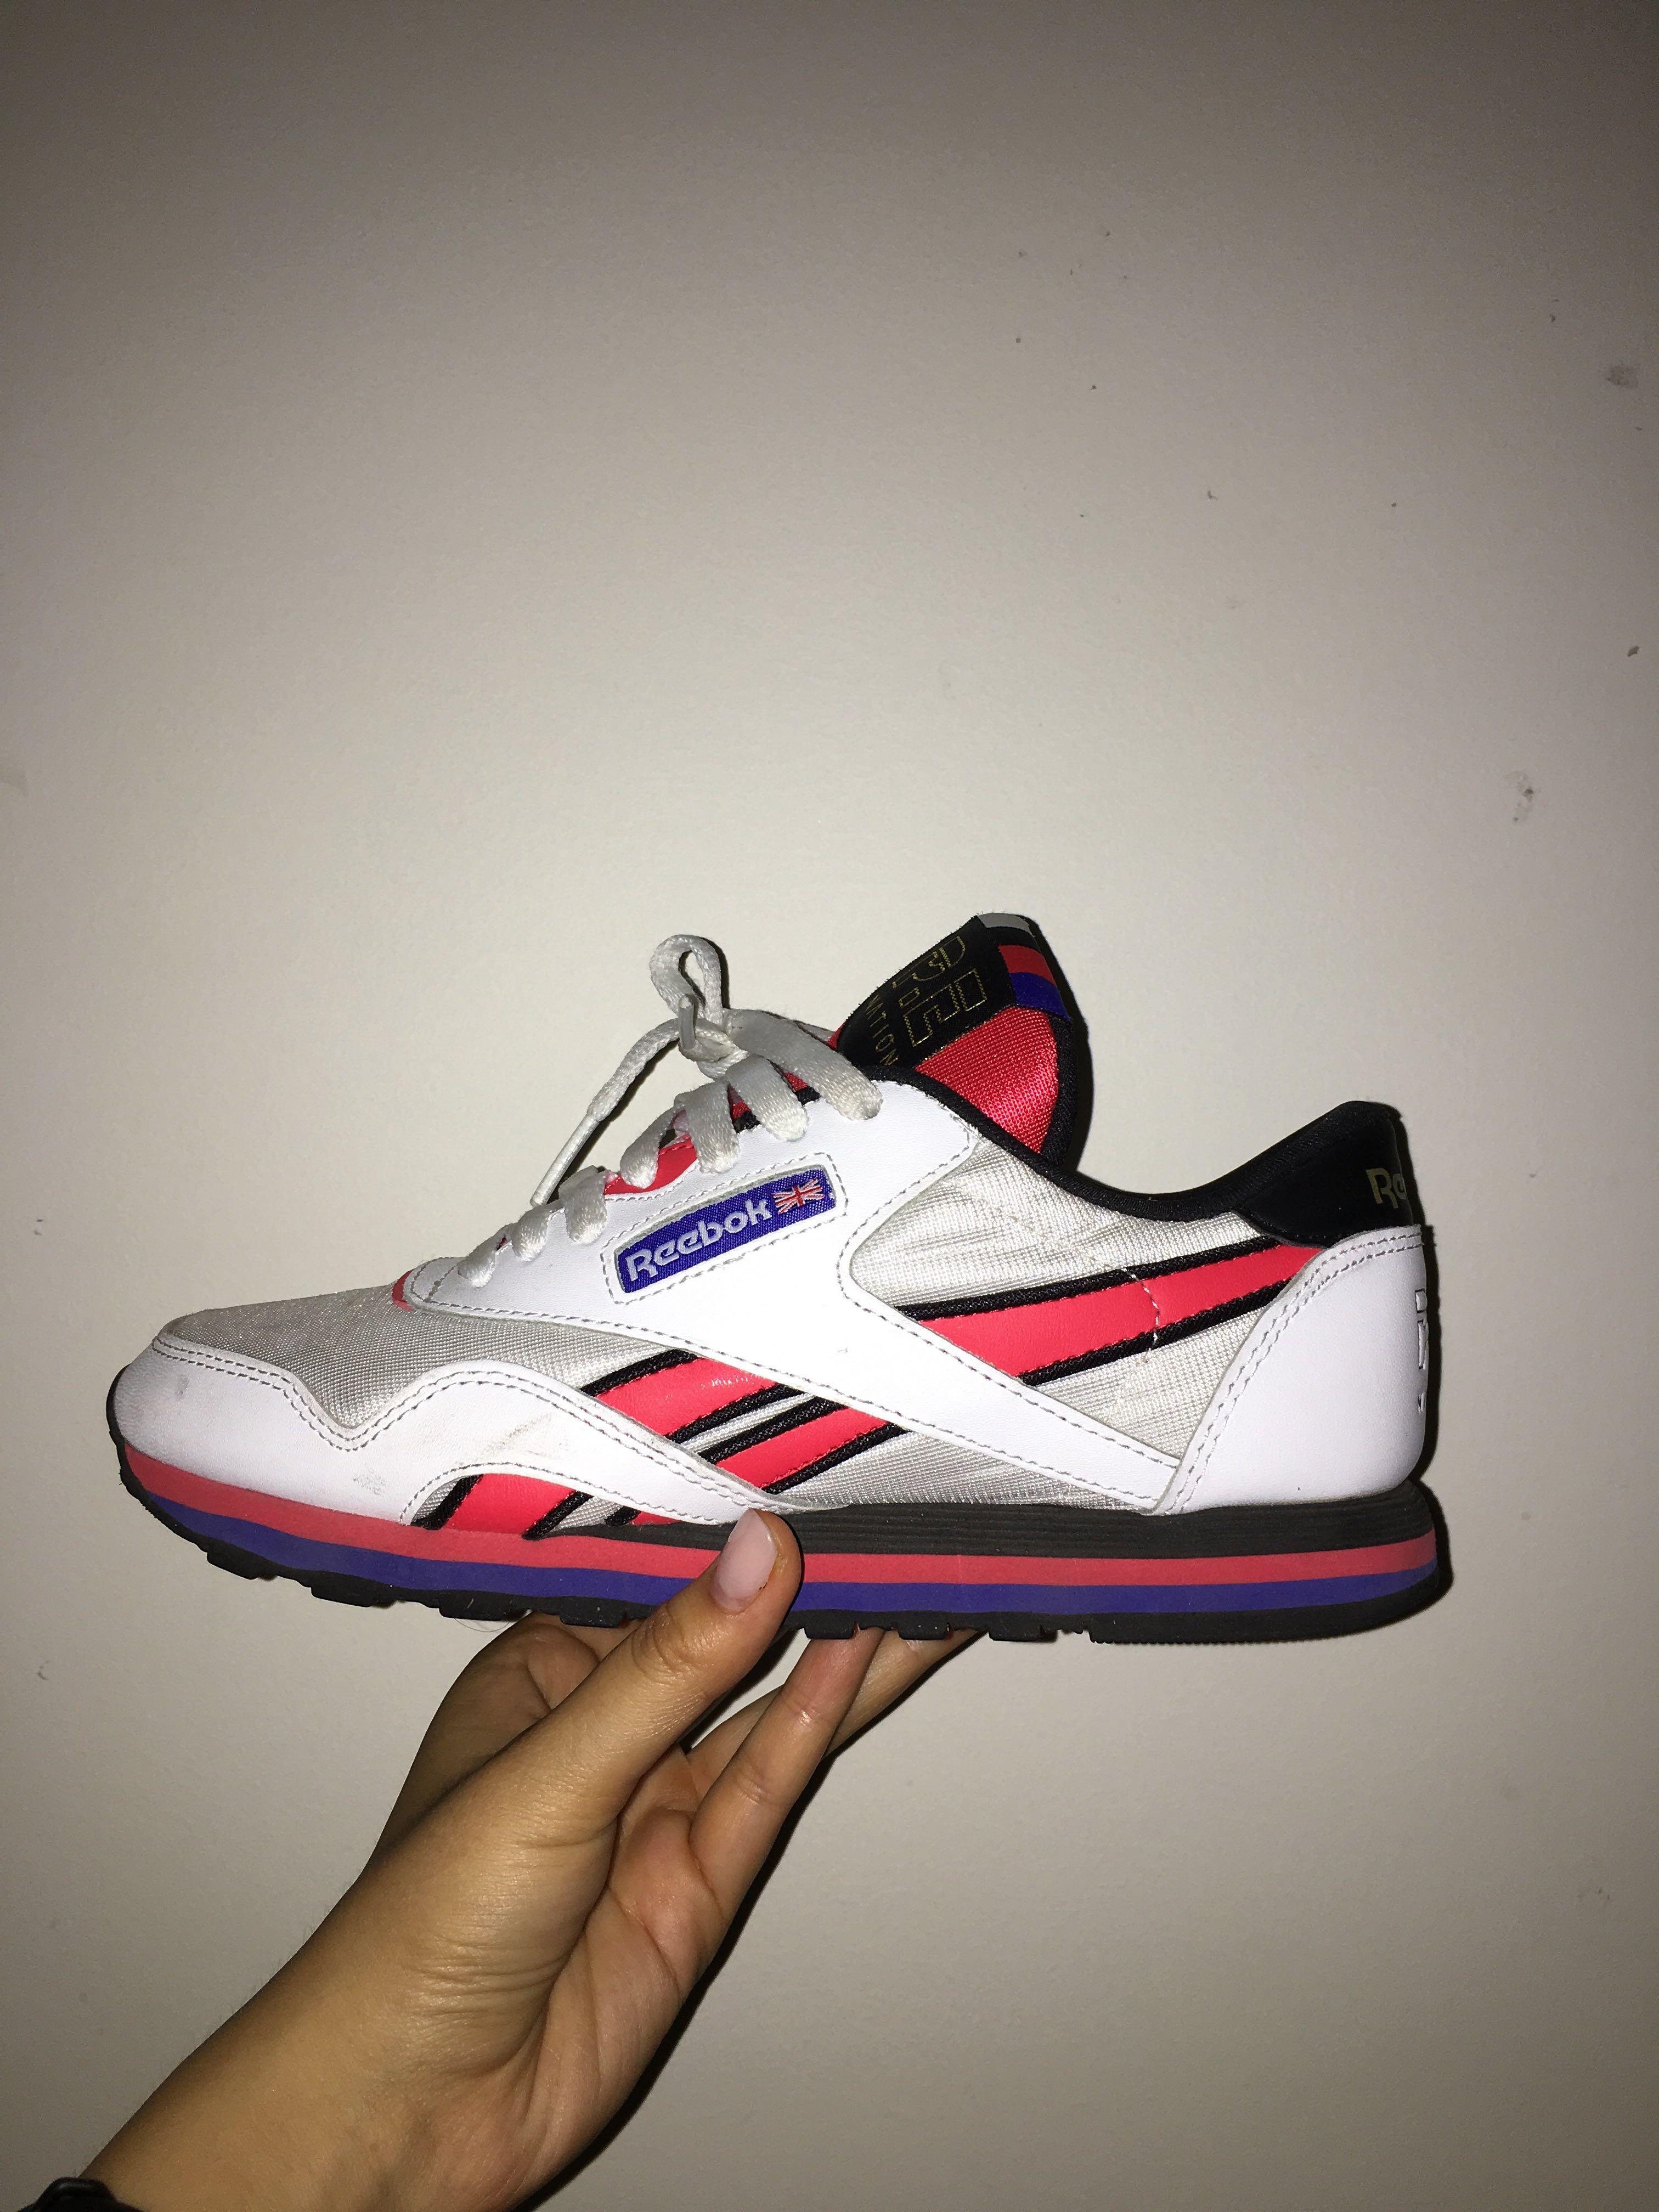 PE Nation x Reebok Sneakers